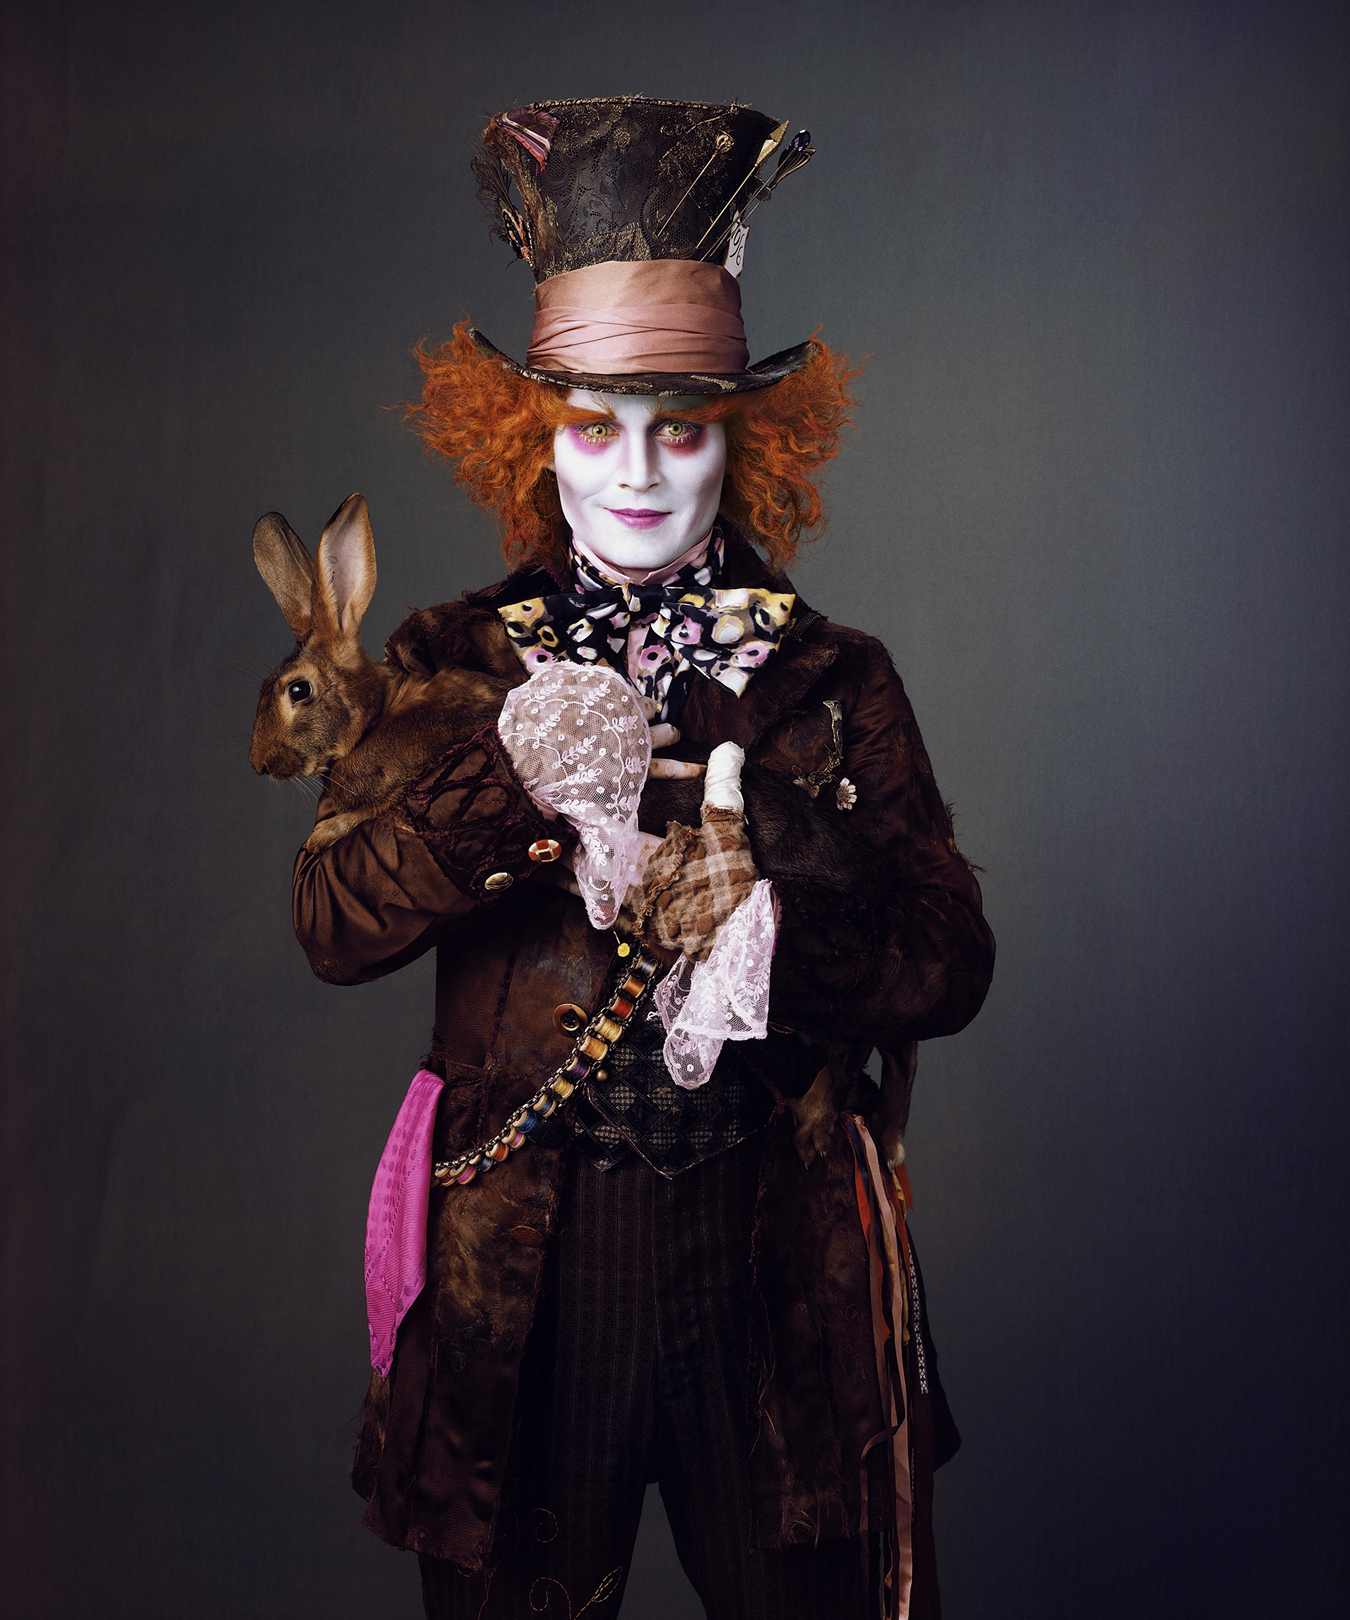 Alice In Wonderland Movie: Movies: Depp City: Johnny Depp Characters On Pinterest